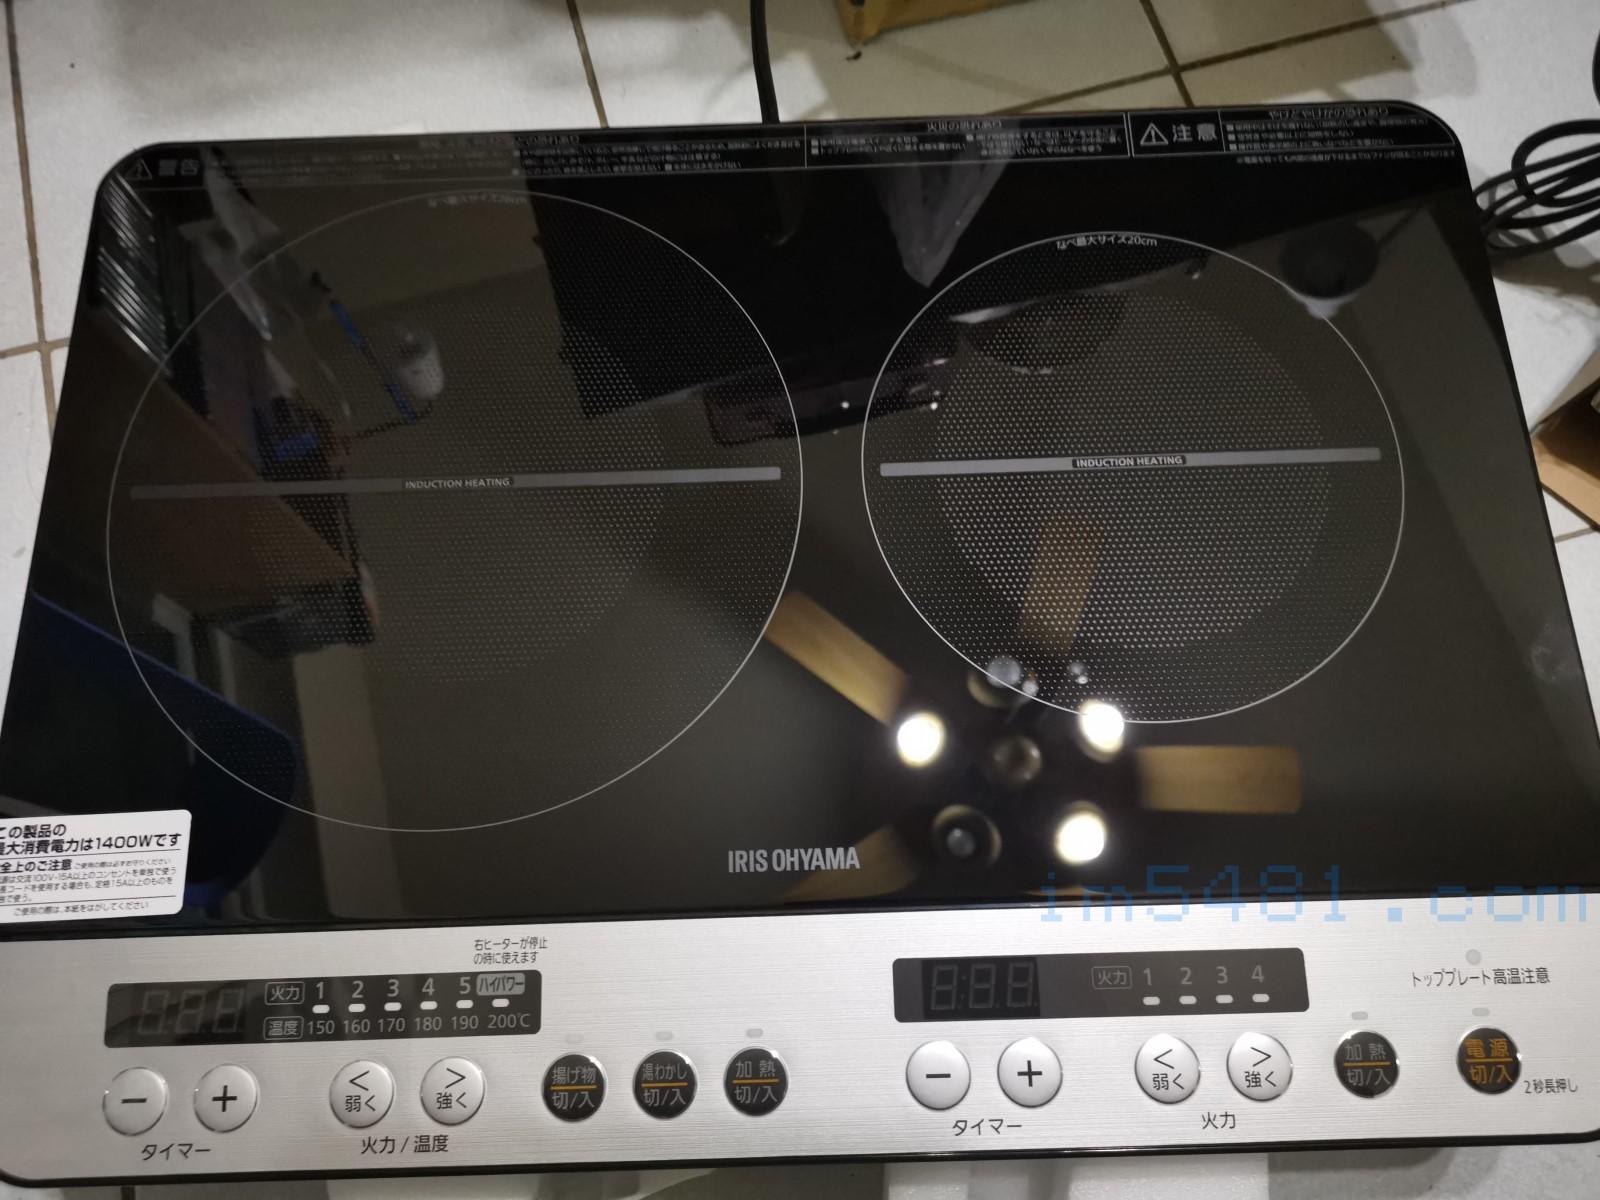 IHK-W12SP-B 雙口爐開箱-玻璃面板